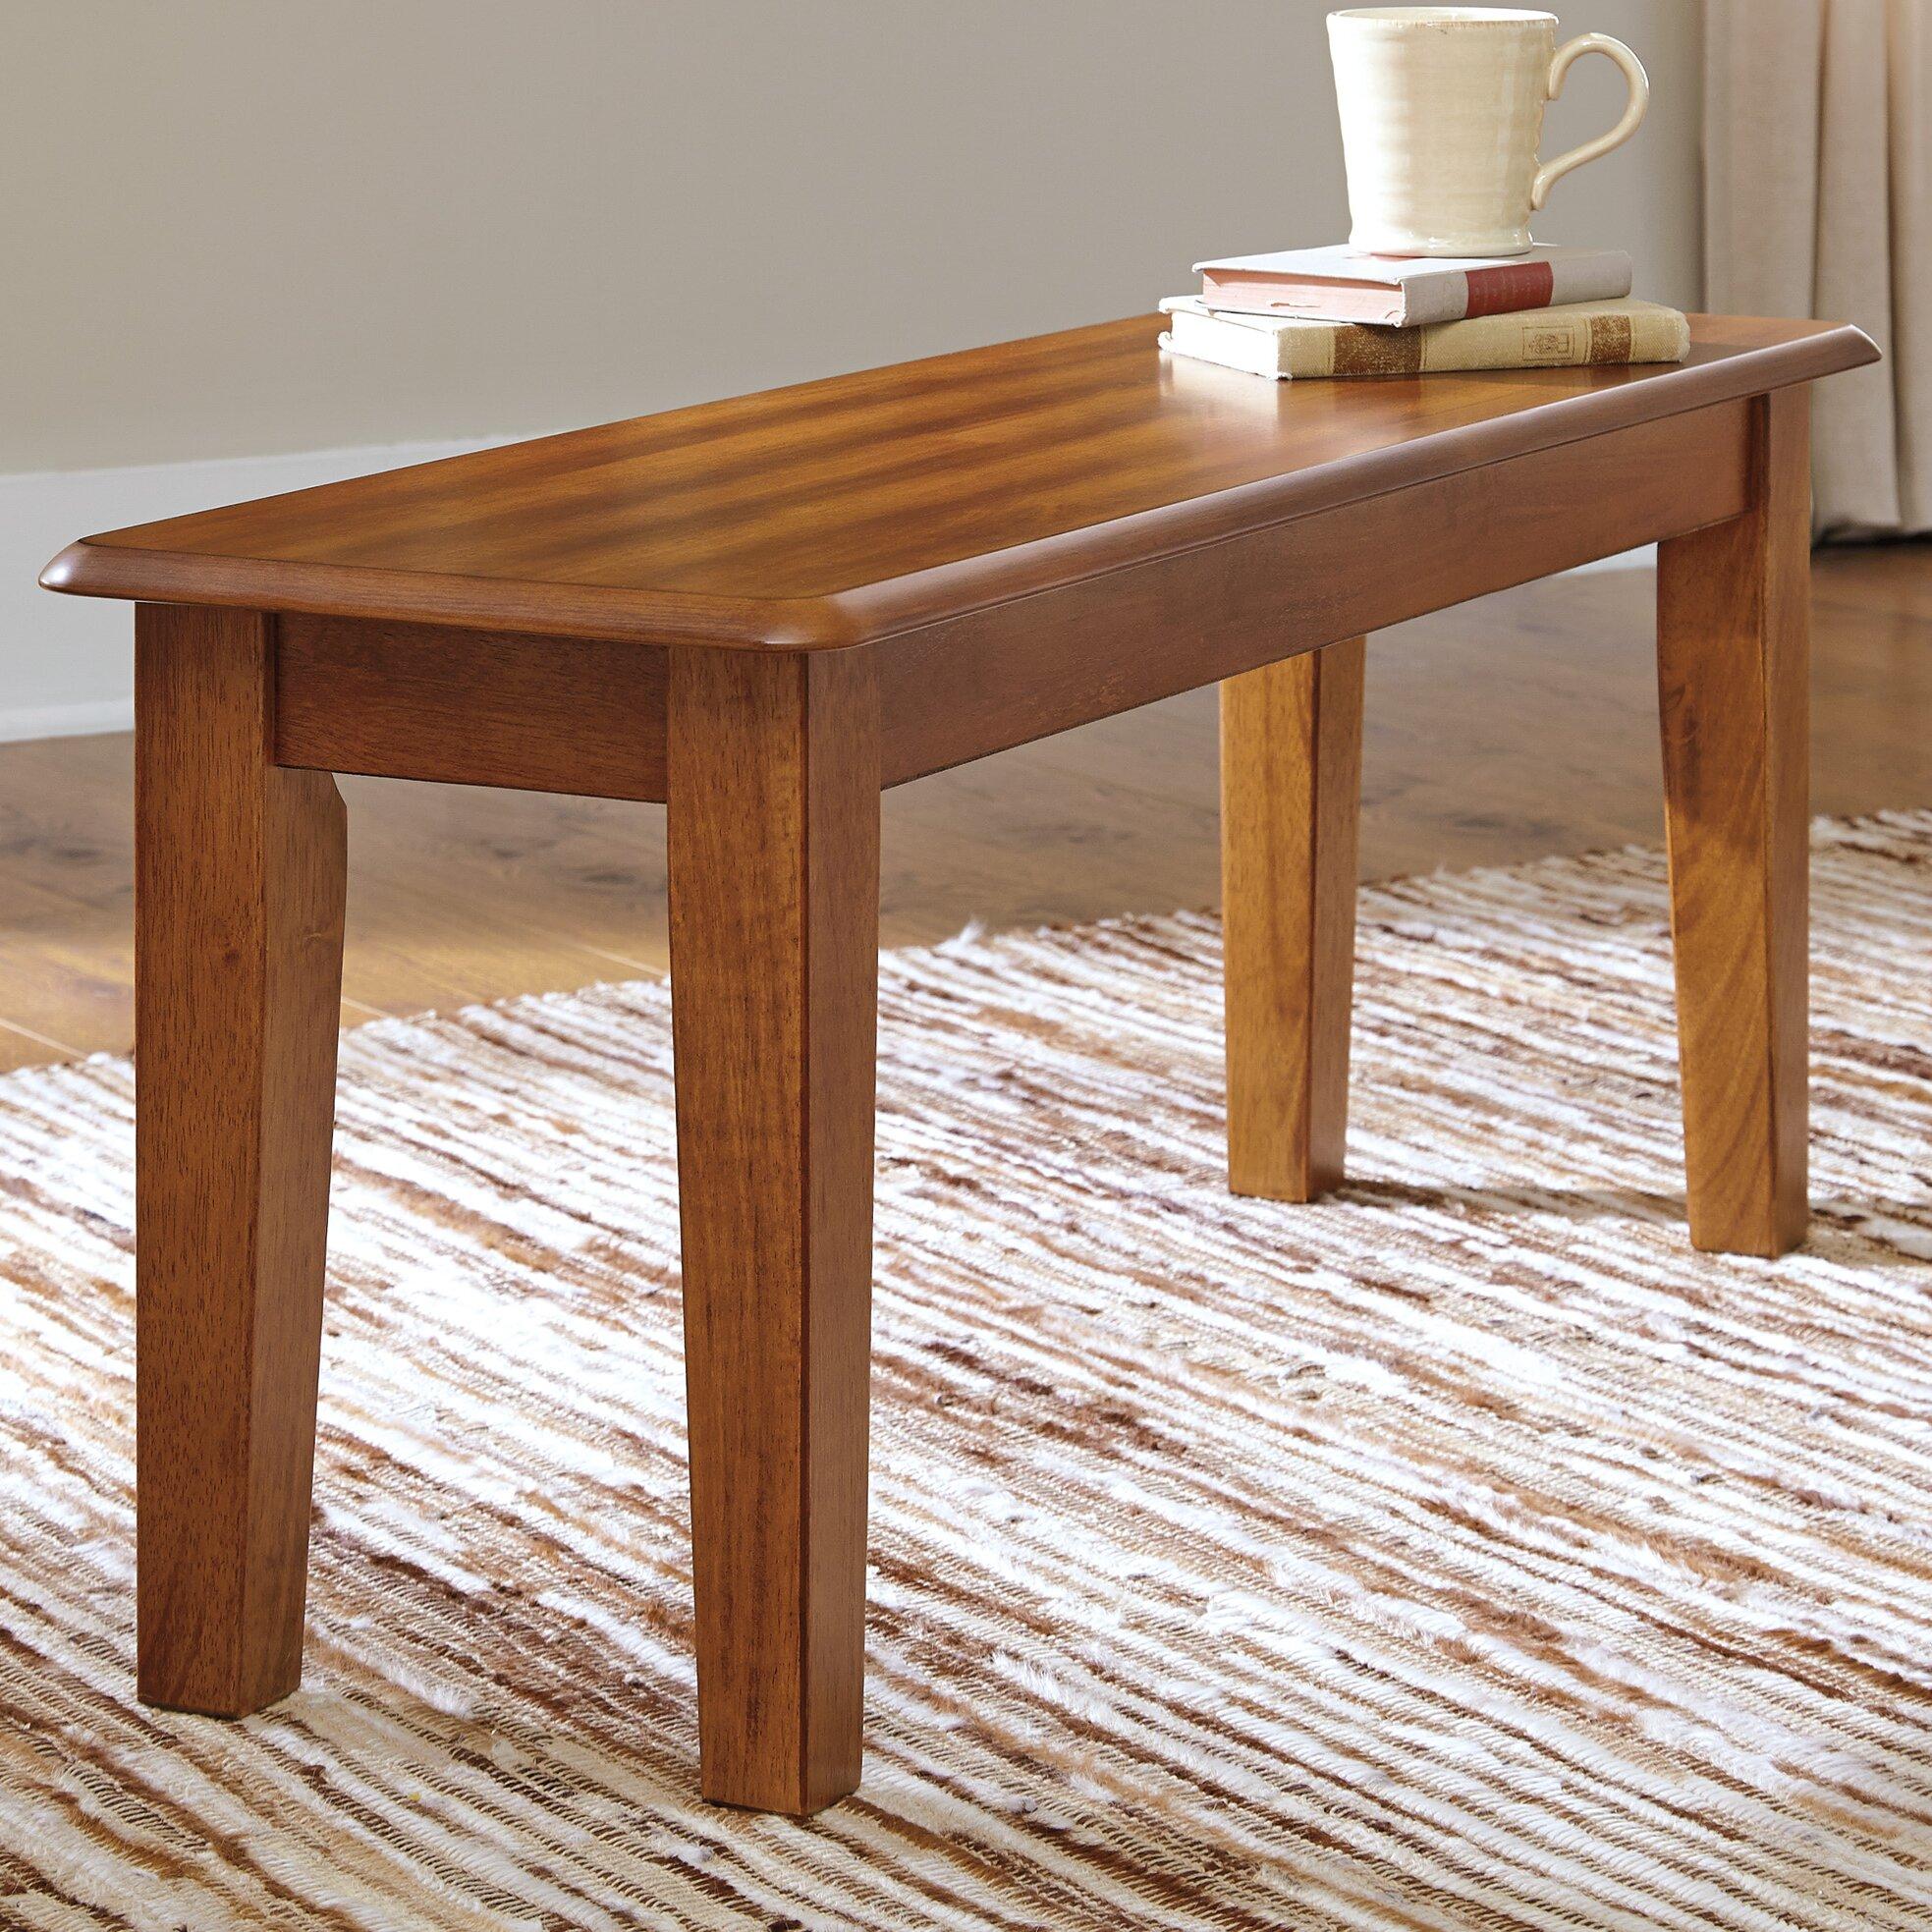 Loon Peak Wood Kitchen Bench & Reviews